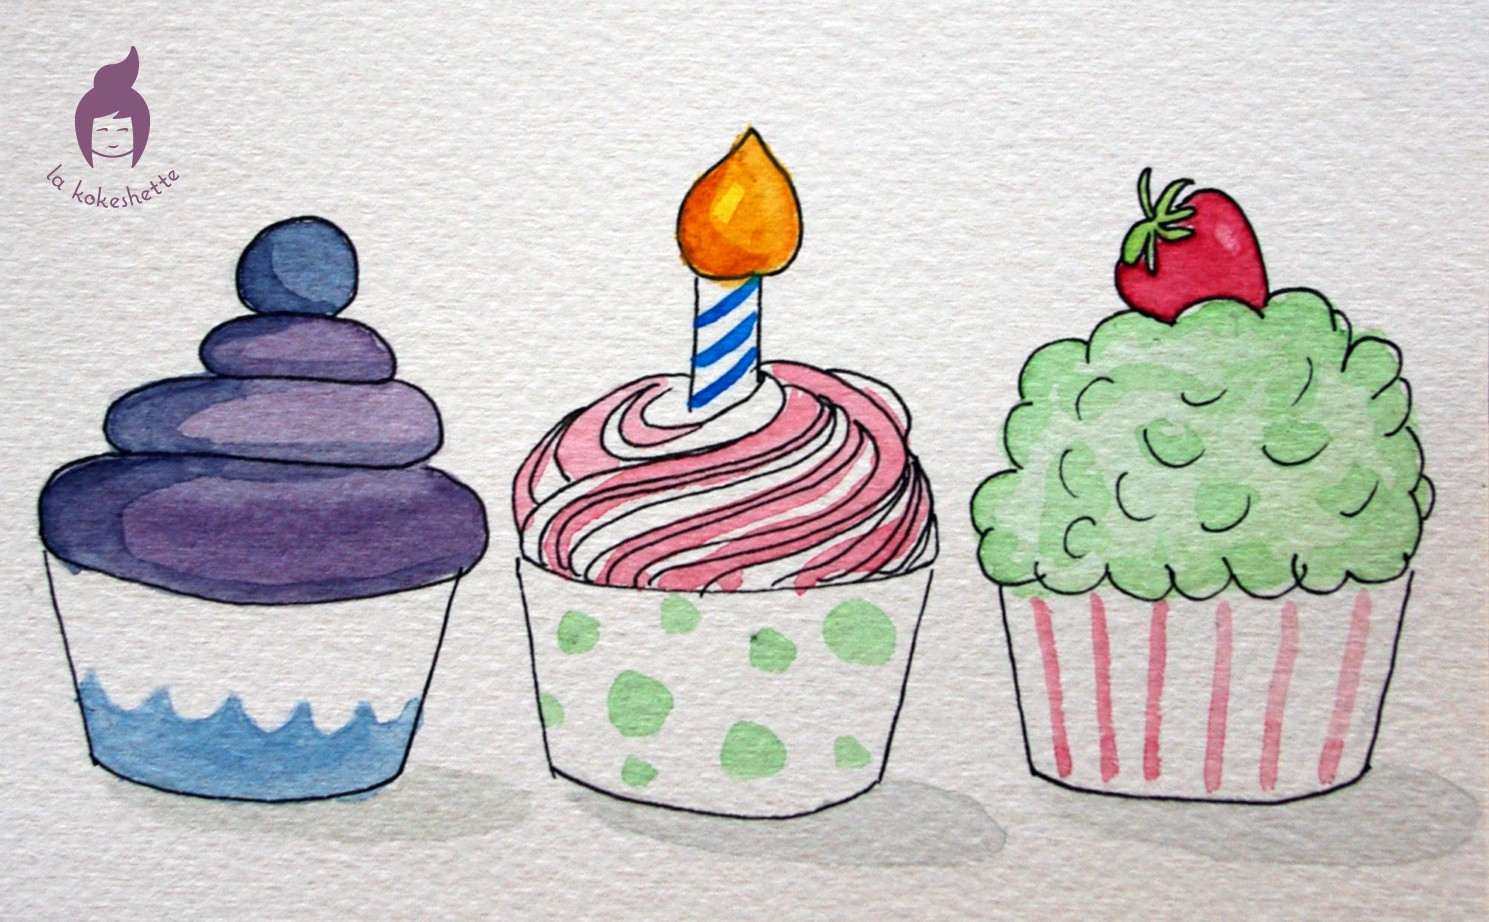 Cupcakes À Croquer | Le Blog De La Kokeshette serapportantà Cup Cake Dessin